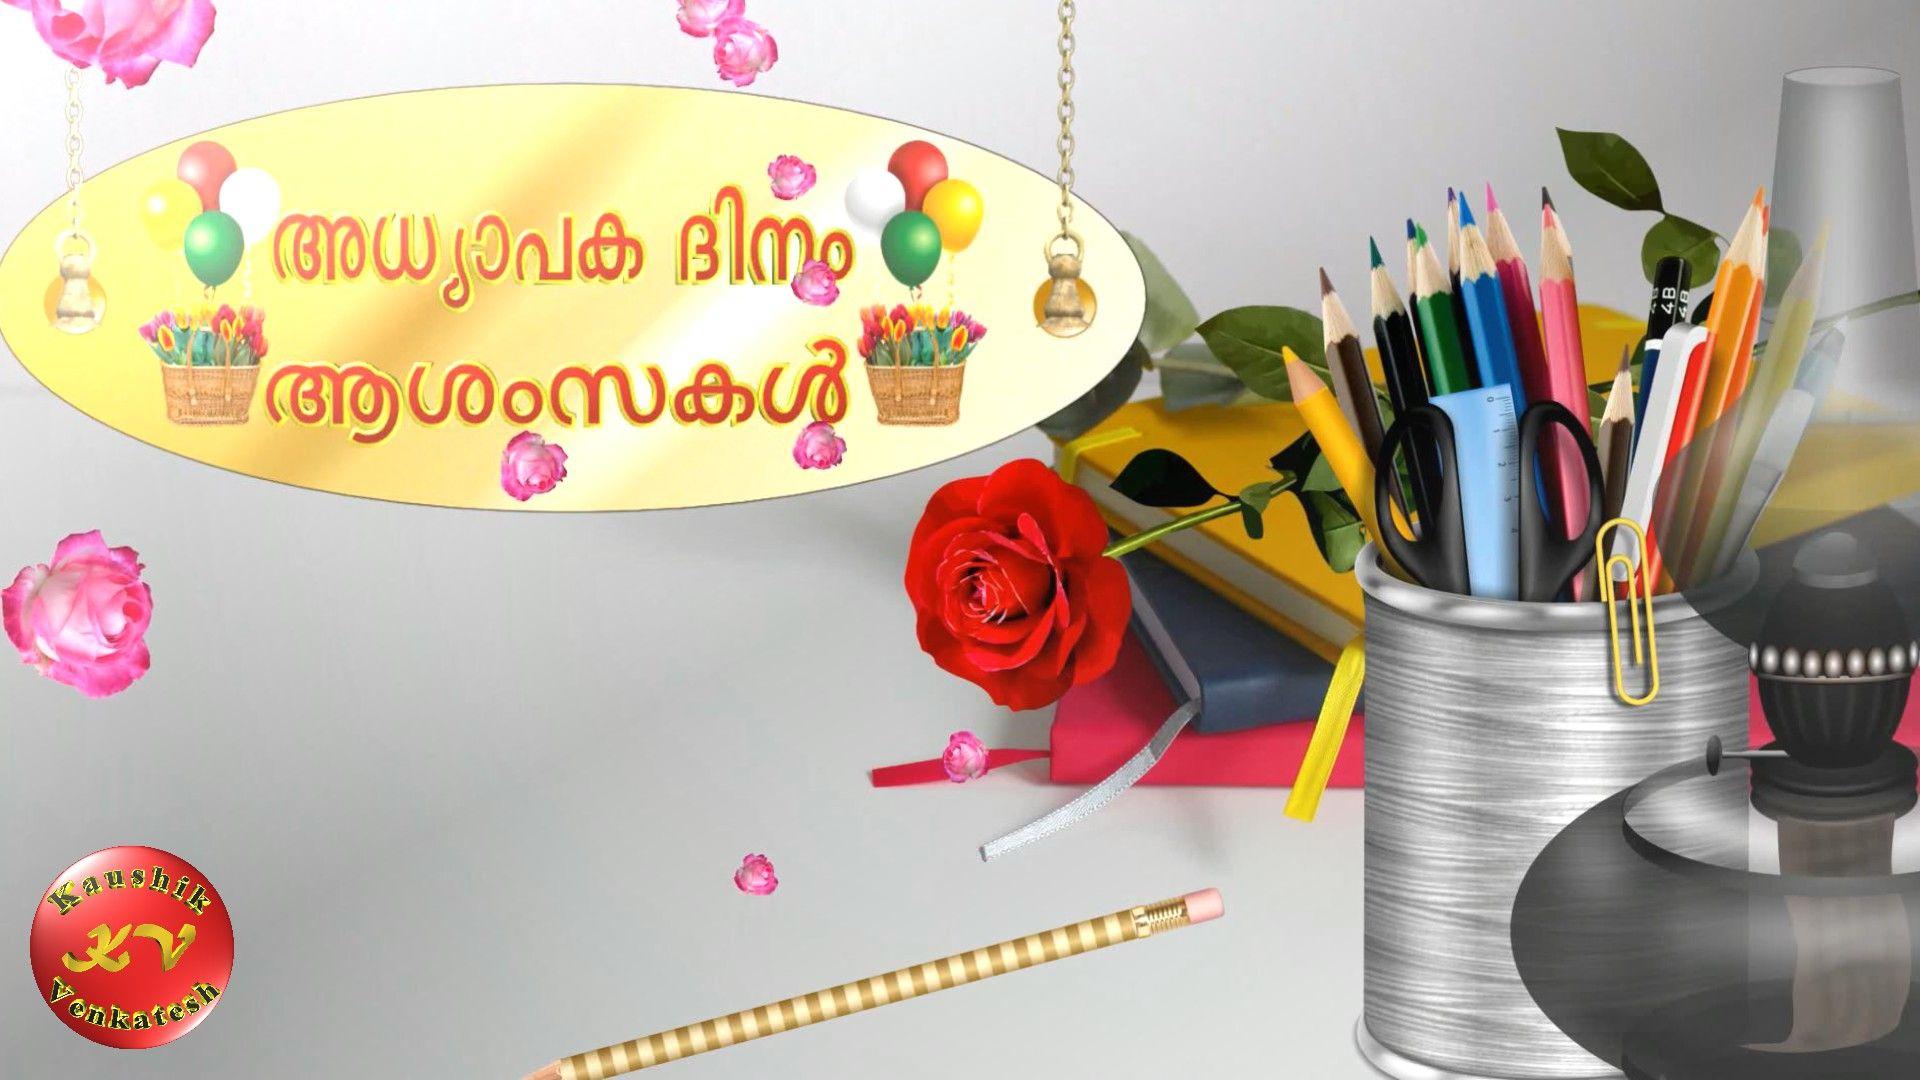 Happy Teachers Day Wishes Malayalam Status Video In 2020 Happy Teachers Day Wishes Happy Teachers Day Teachers Day Wishes